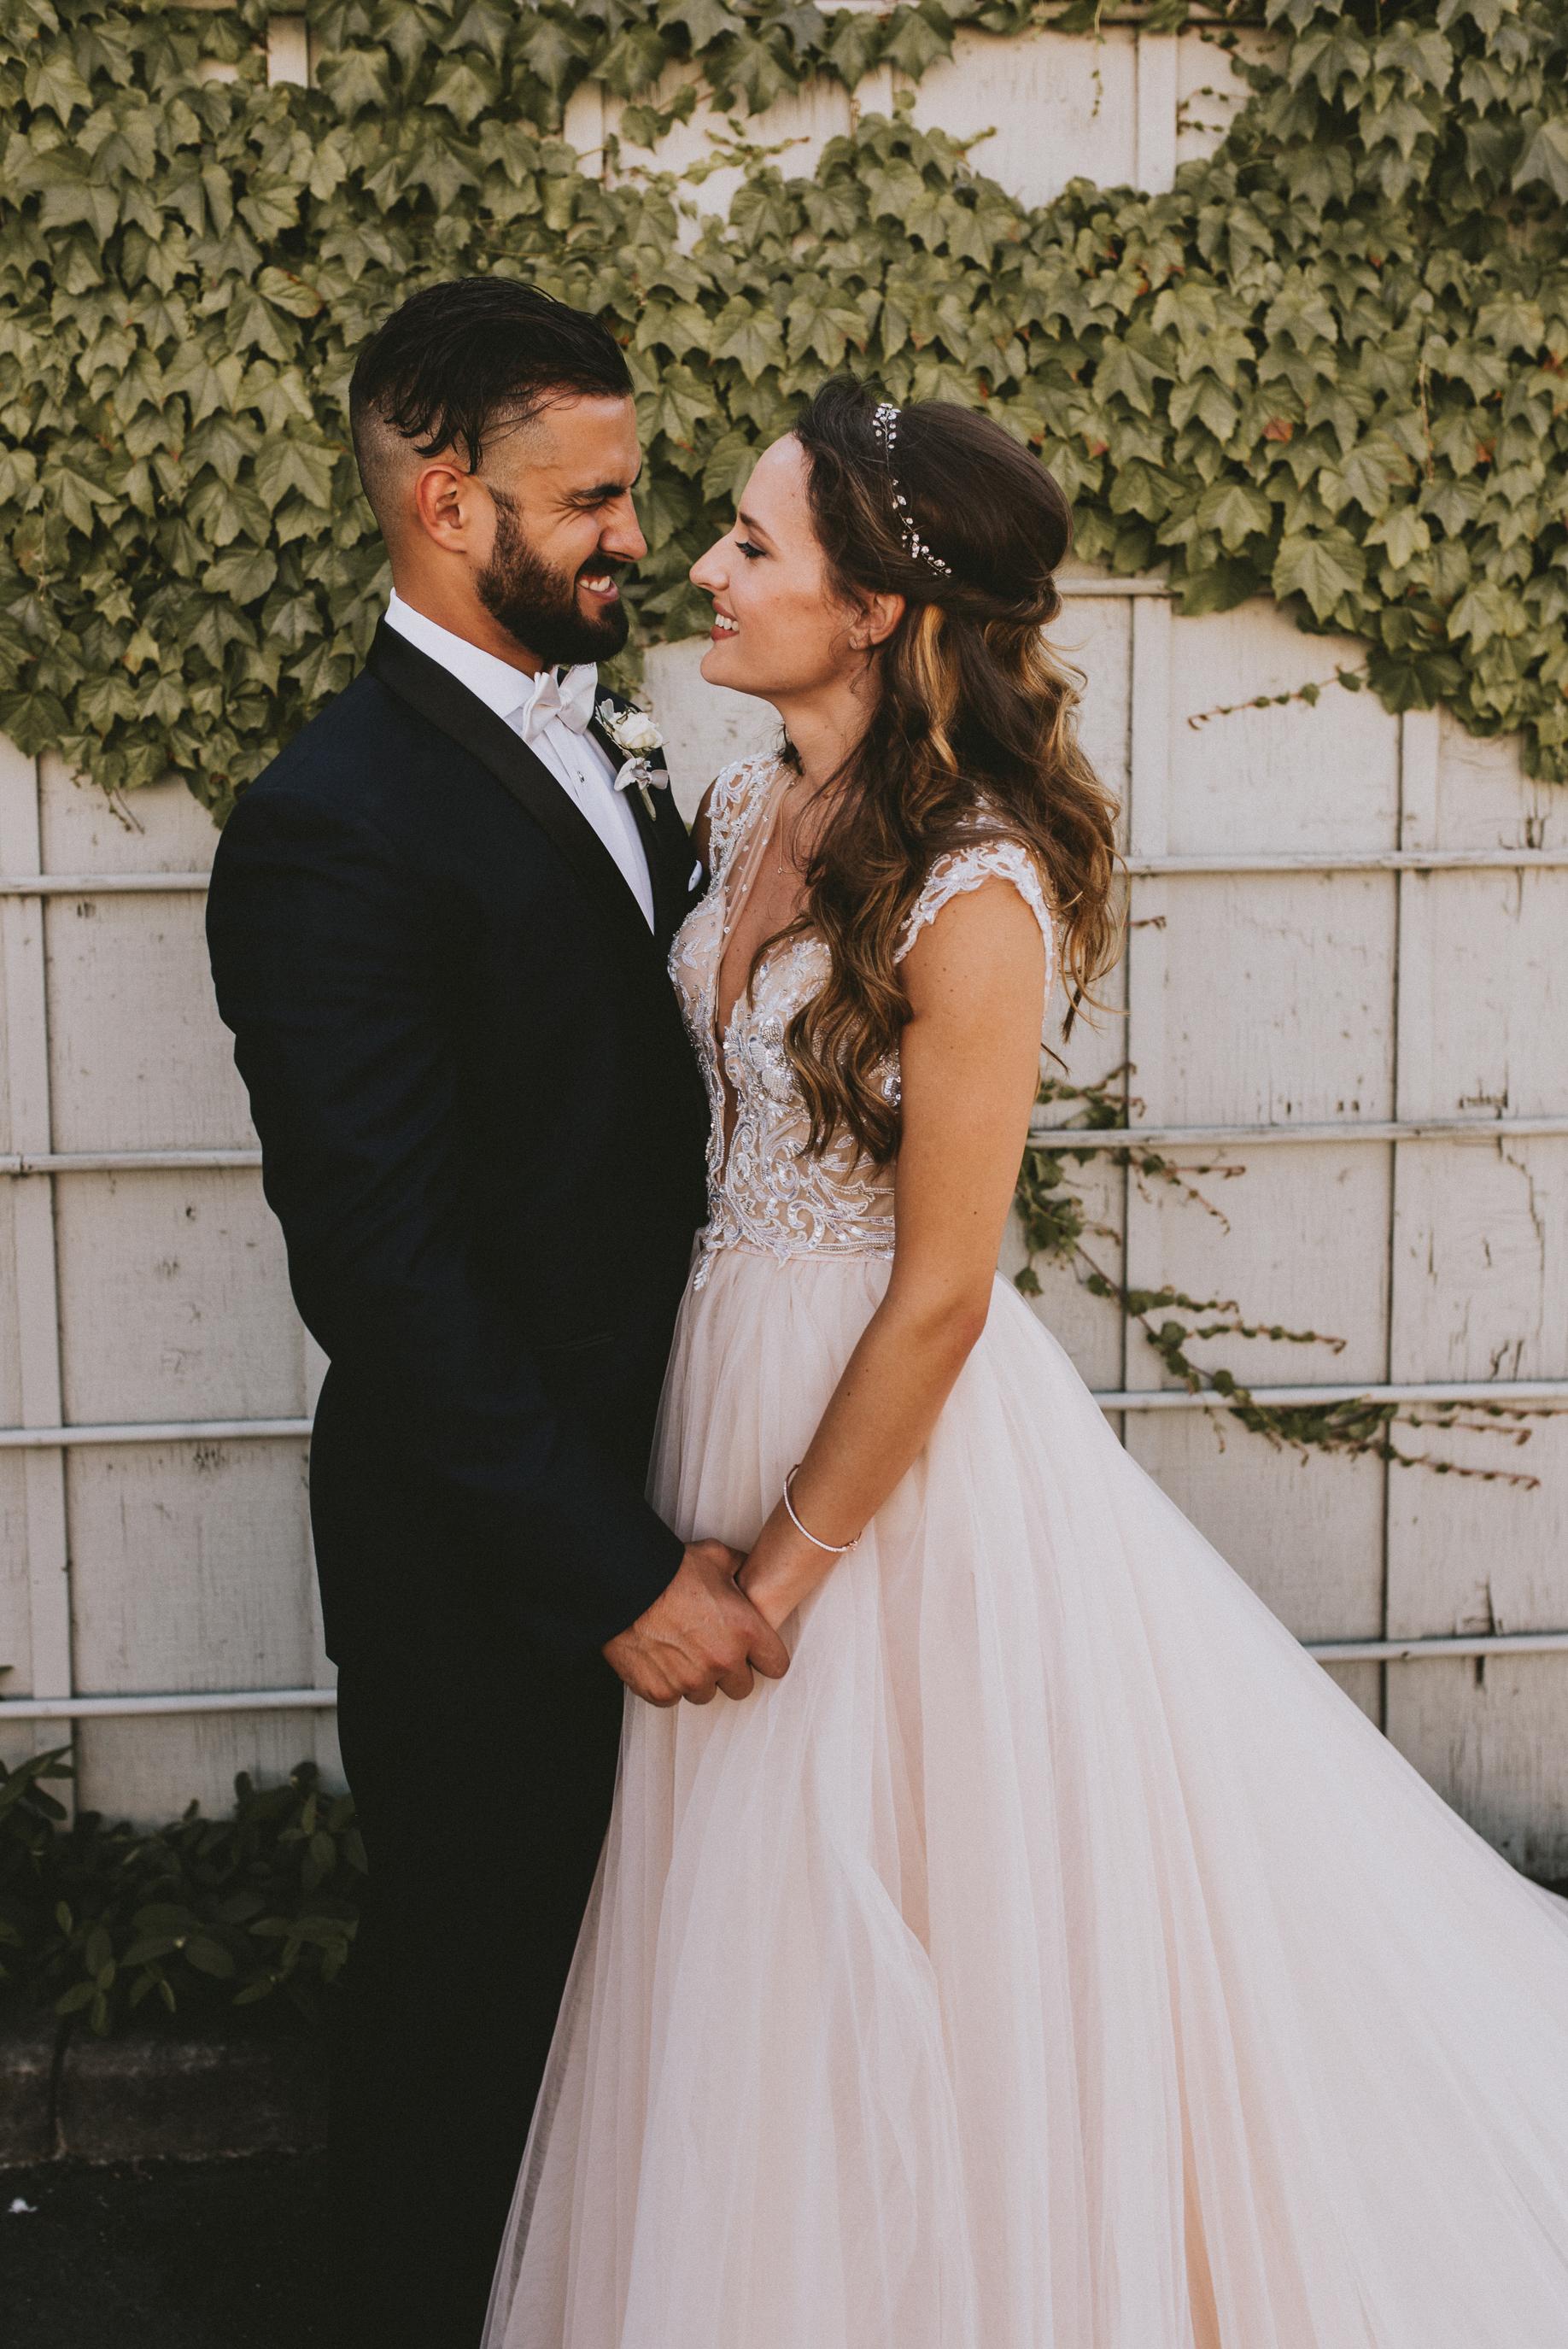 SAMLANDRETH-bridals-7.jpg